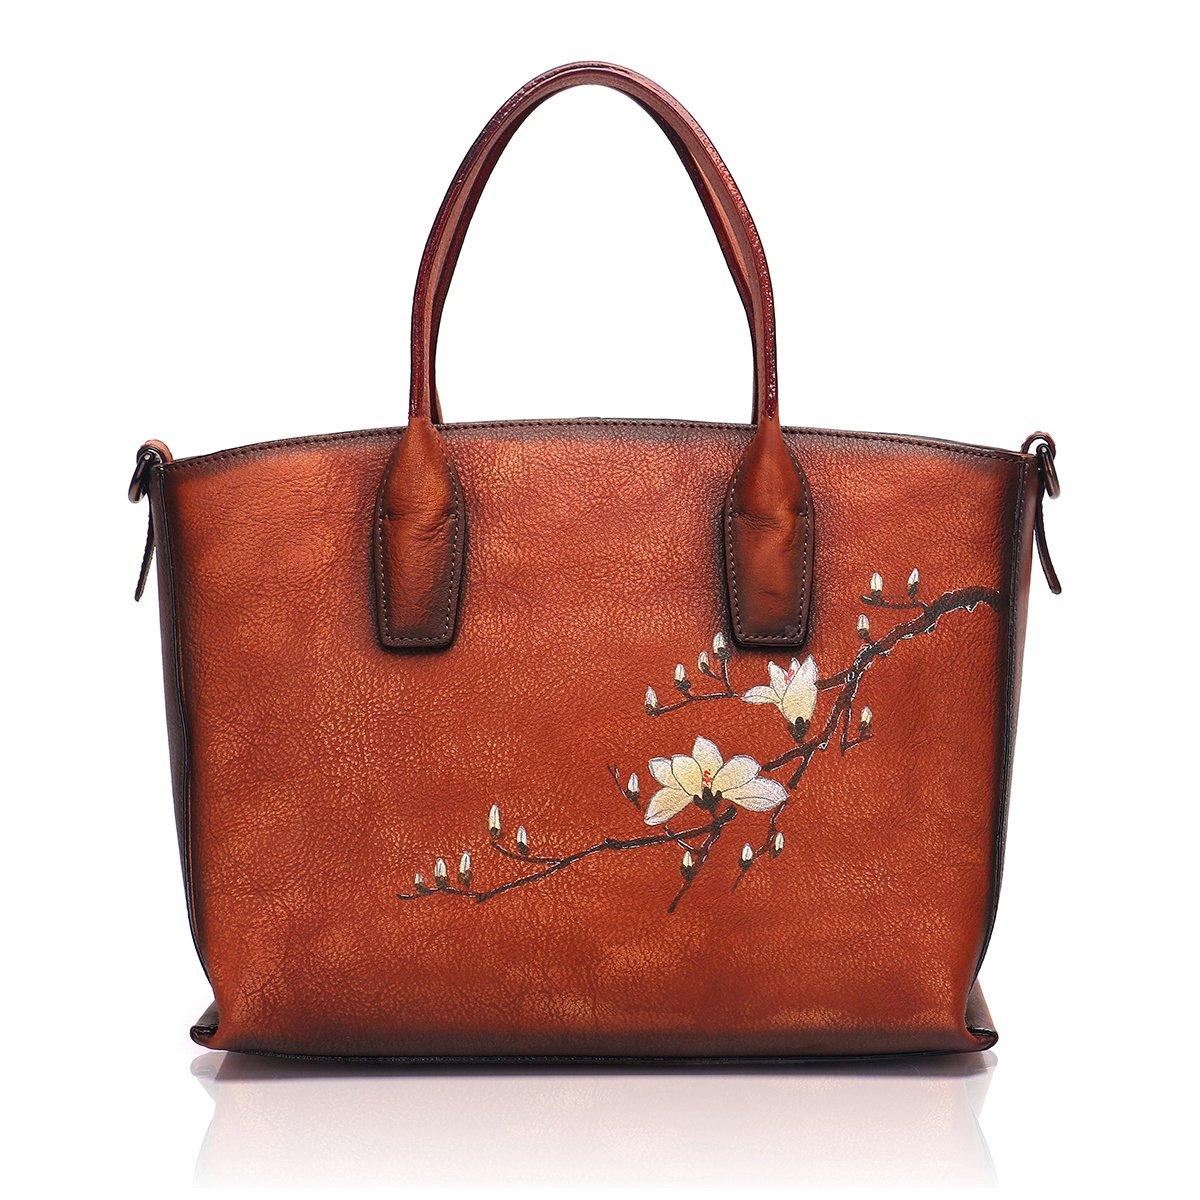 APHISON Designer Soft Leather Totes Handbags for Women, Ladies Satchels Shoulder Bags 8205